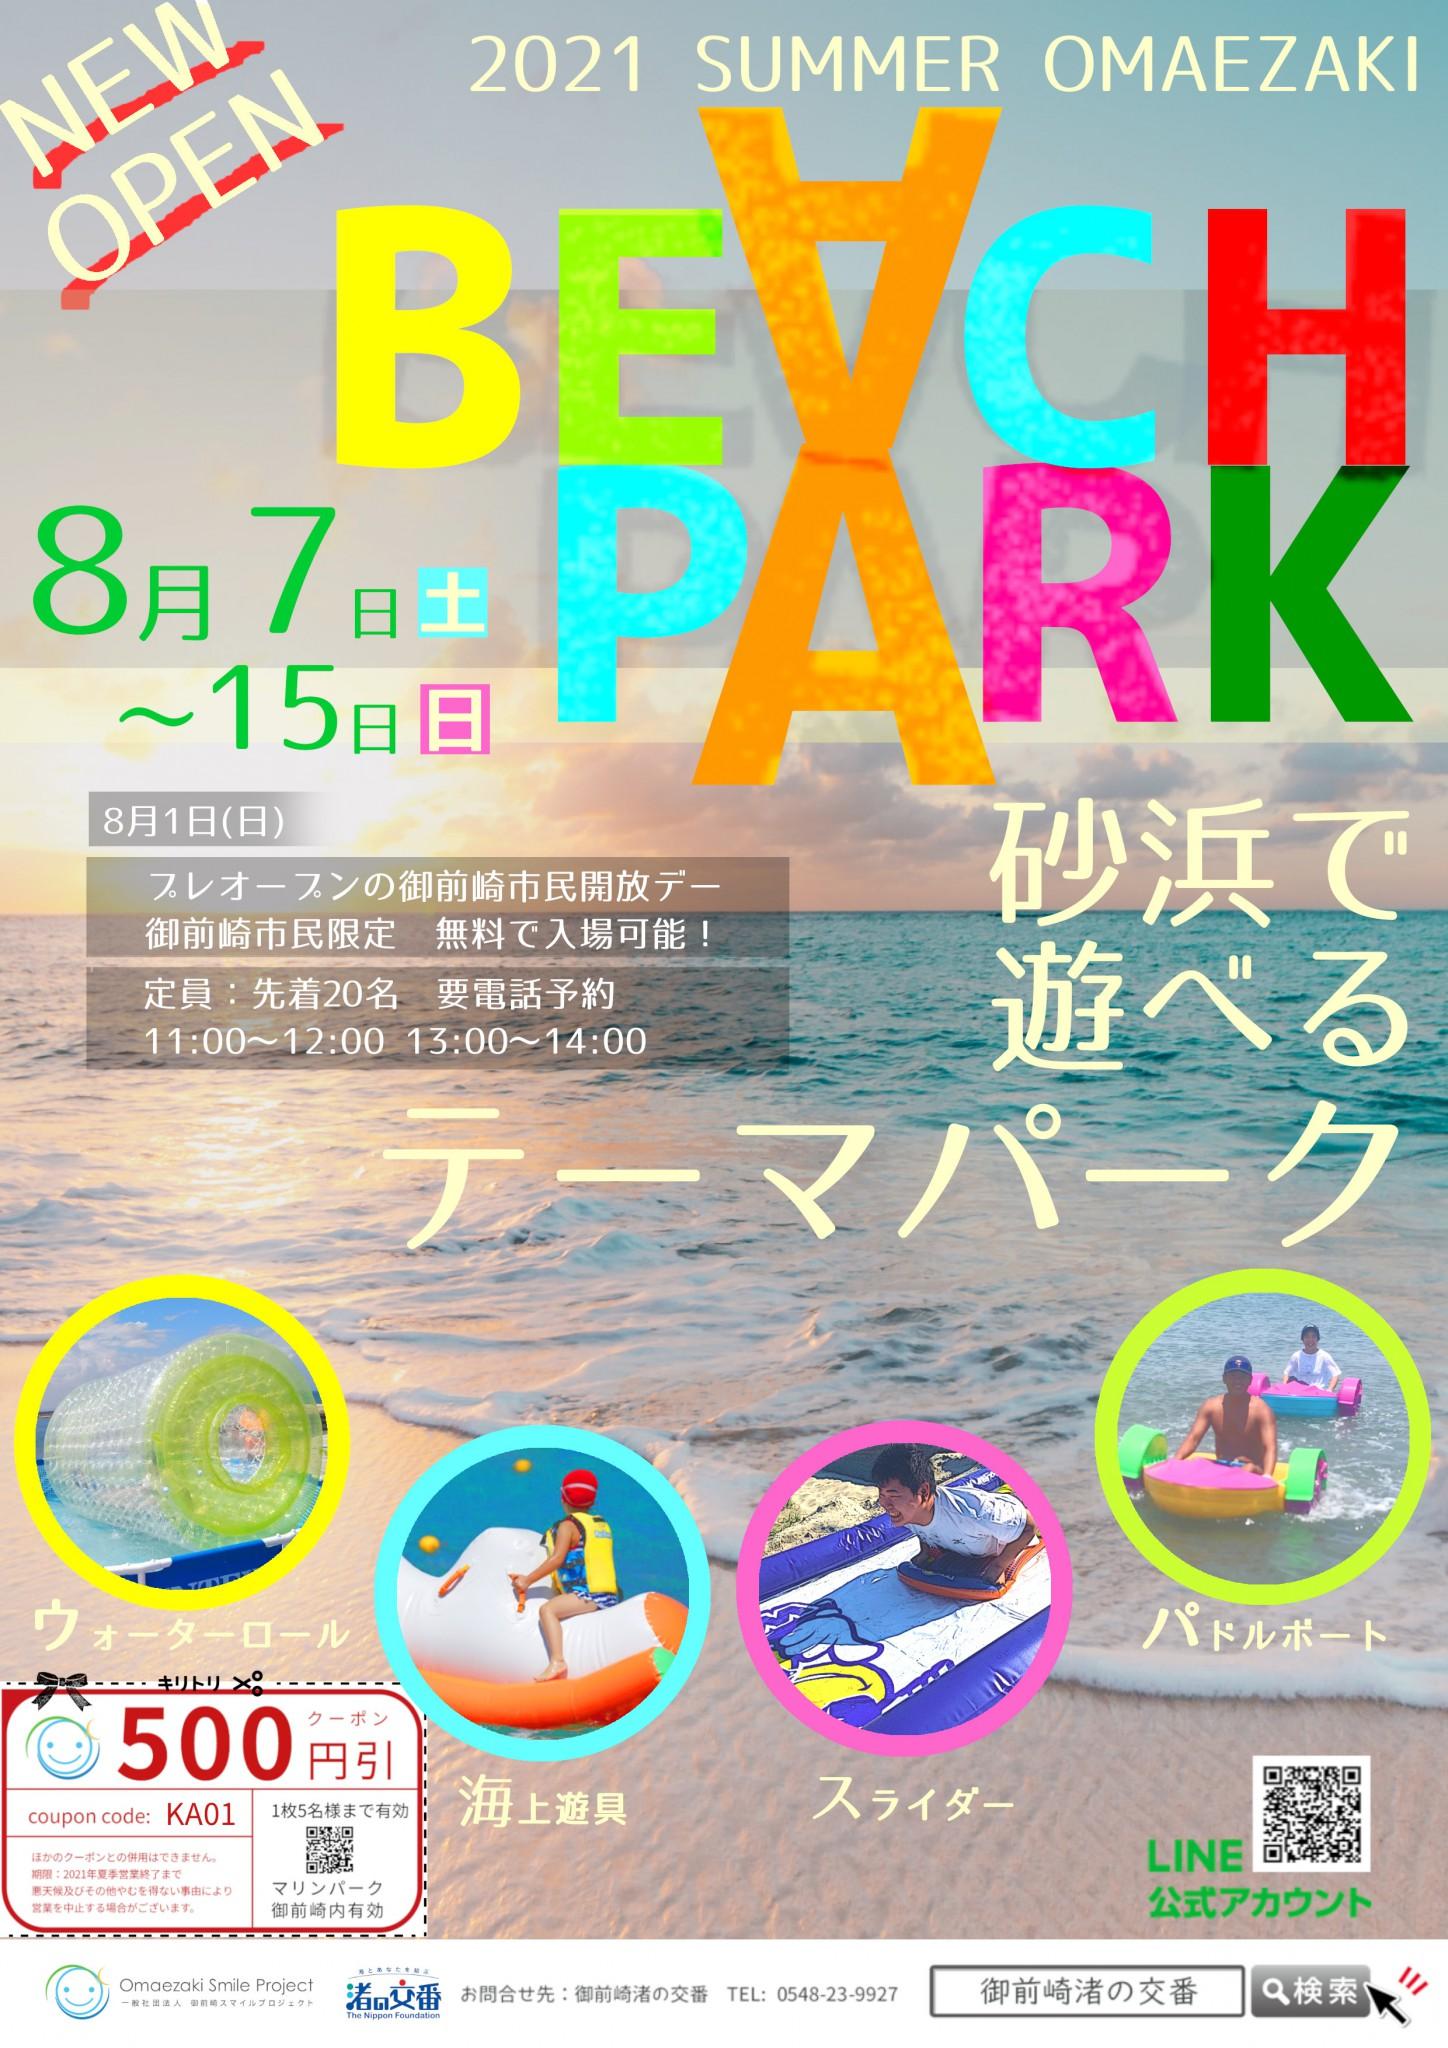 BEACH_PARK_kanko